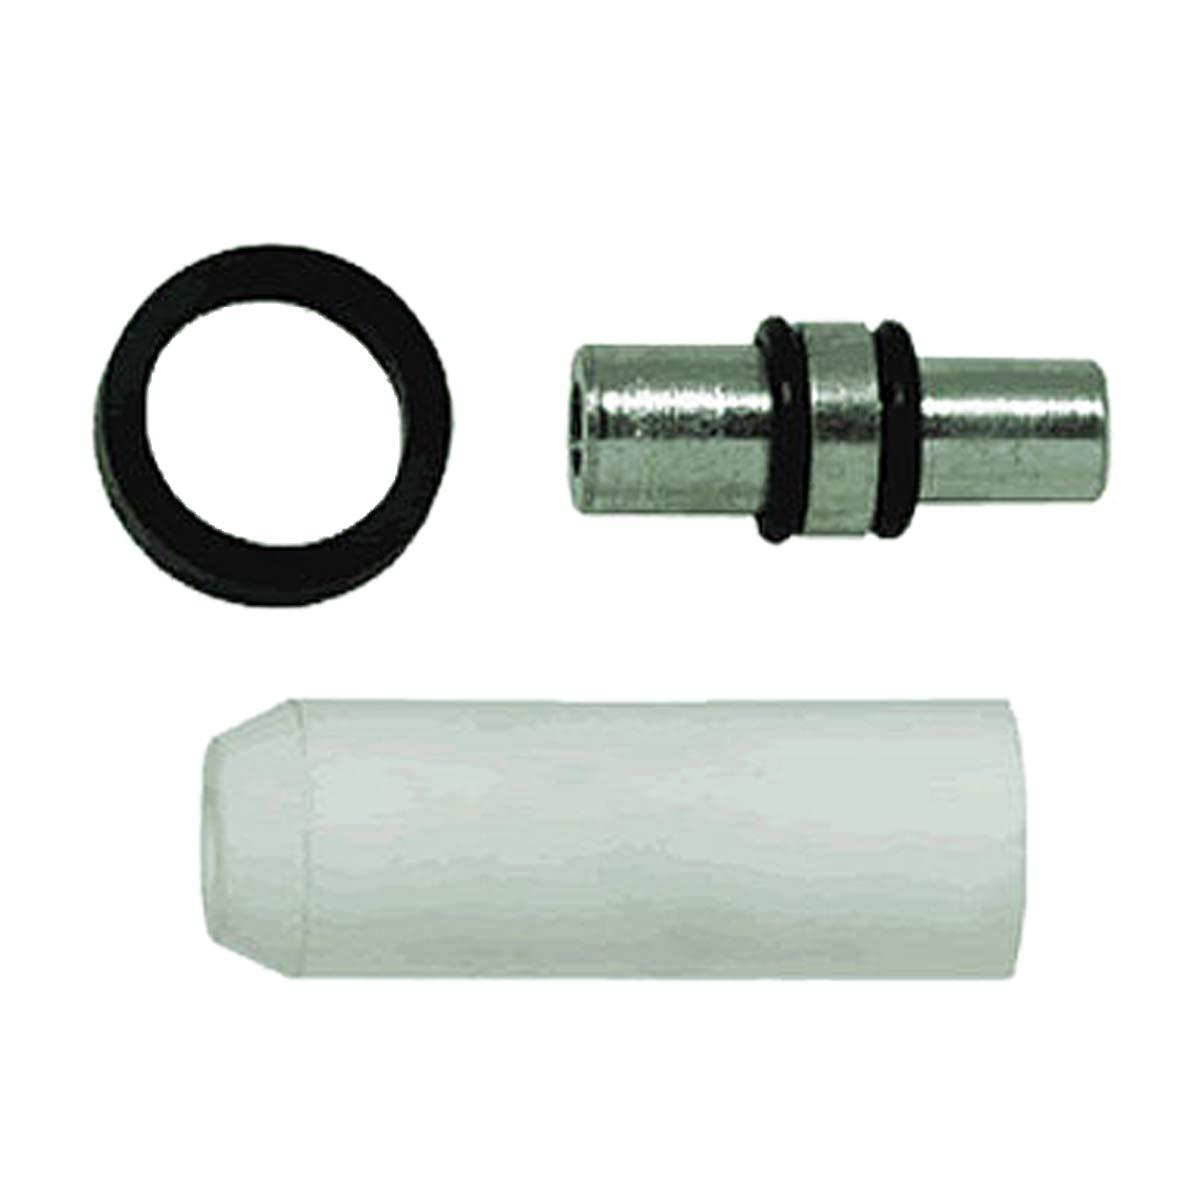 Campbell Hausfeld CH Ceramic Nozzle Kit (MP310900AV)